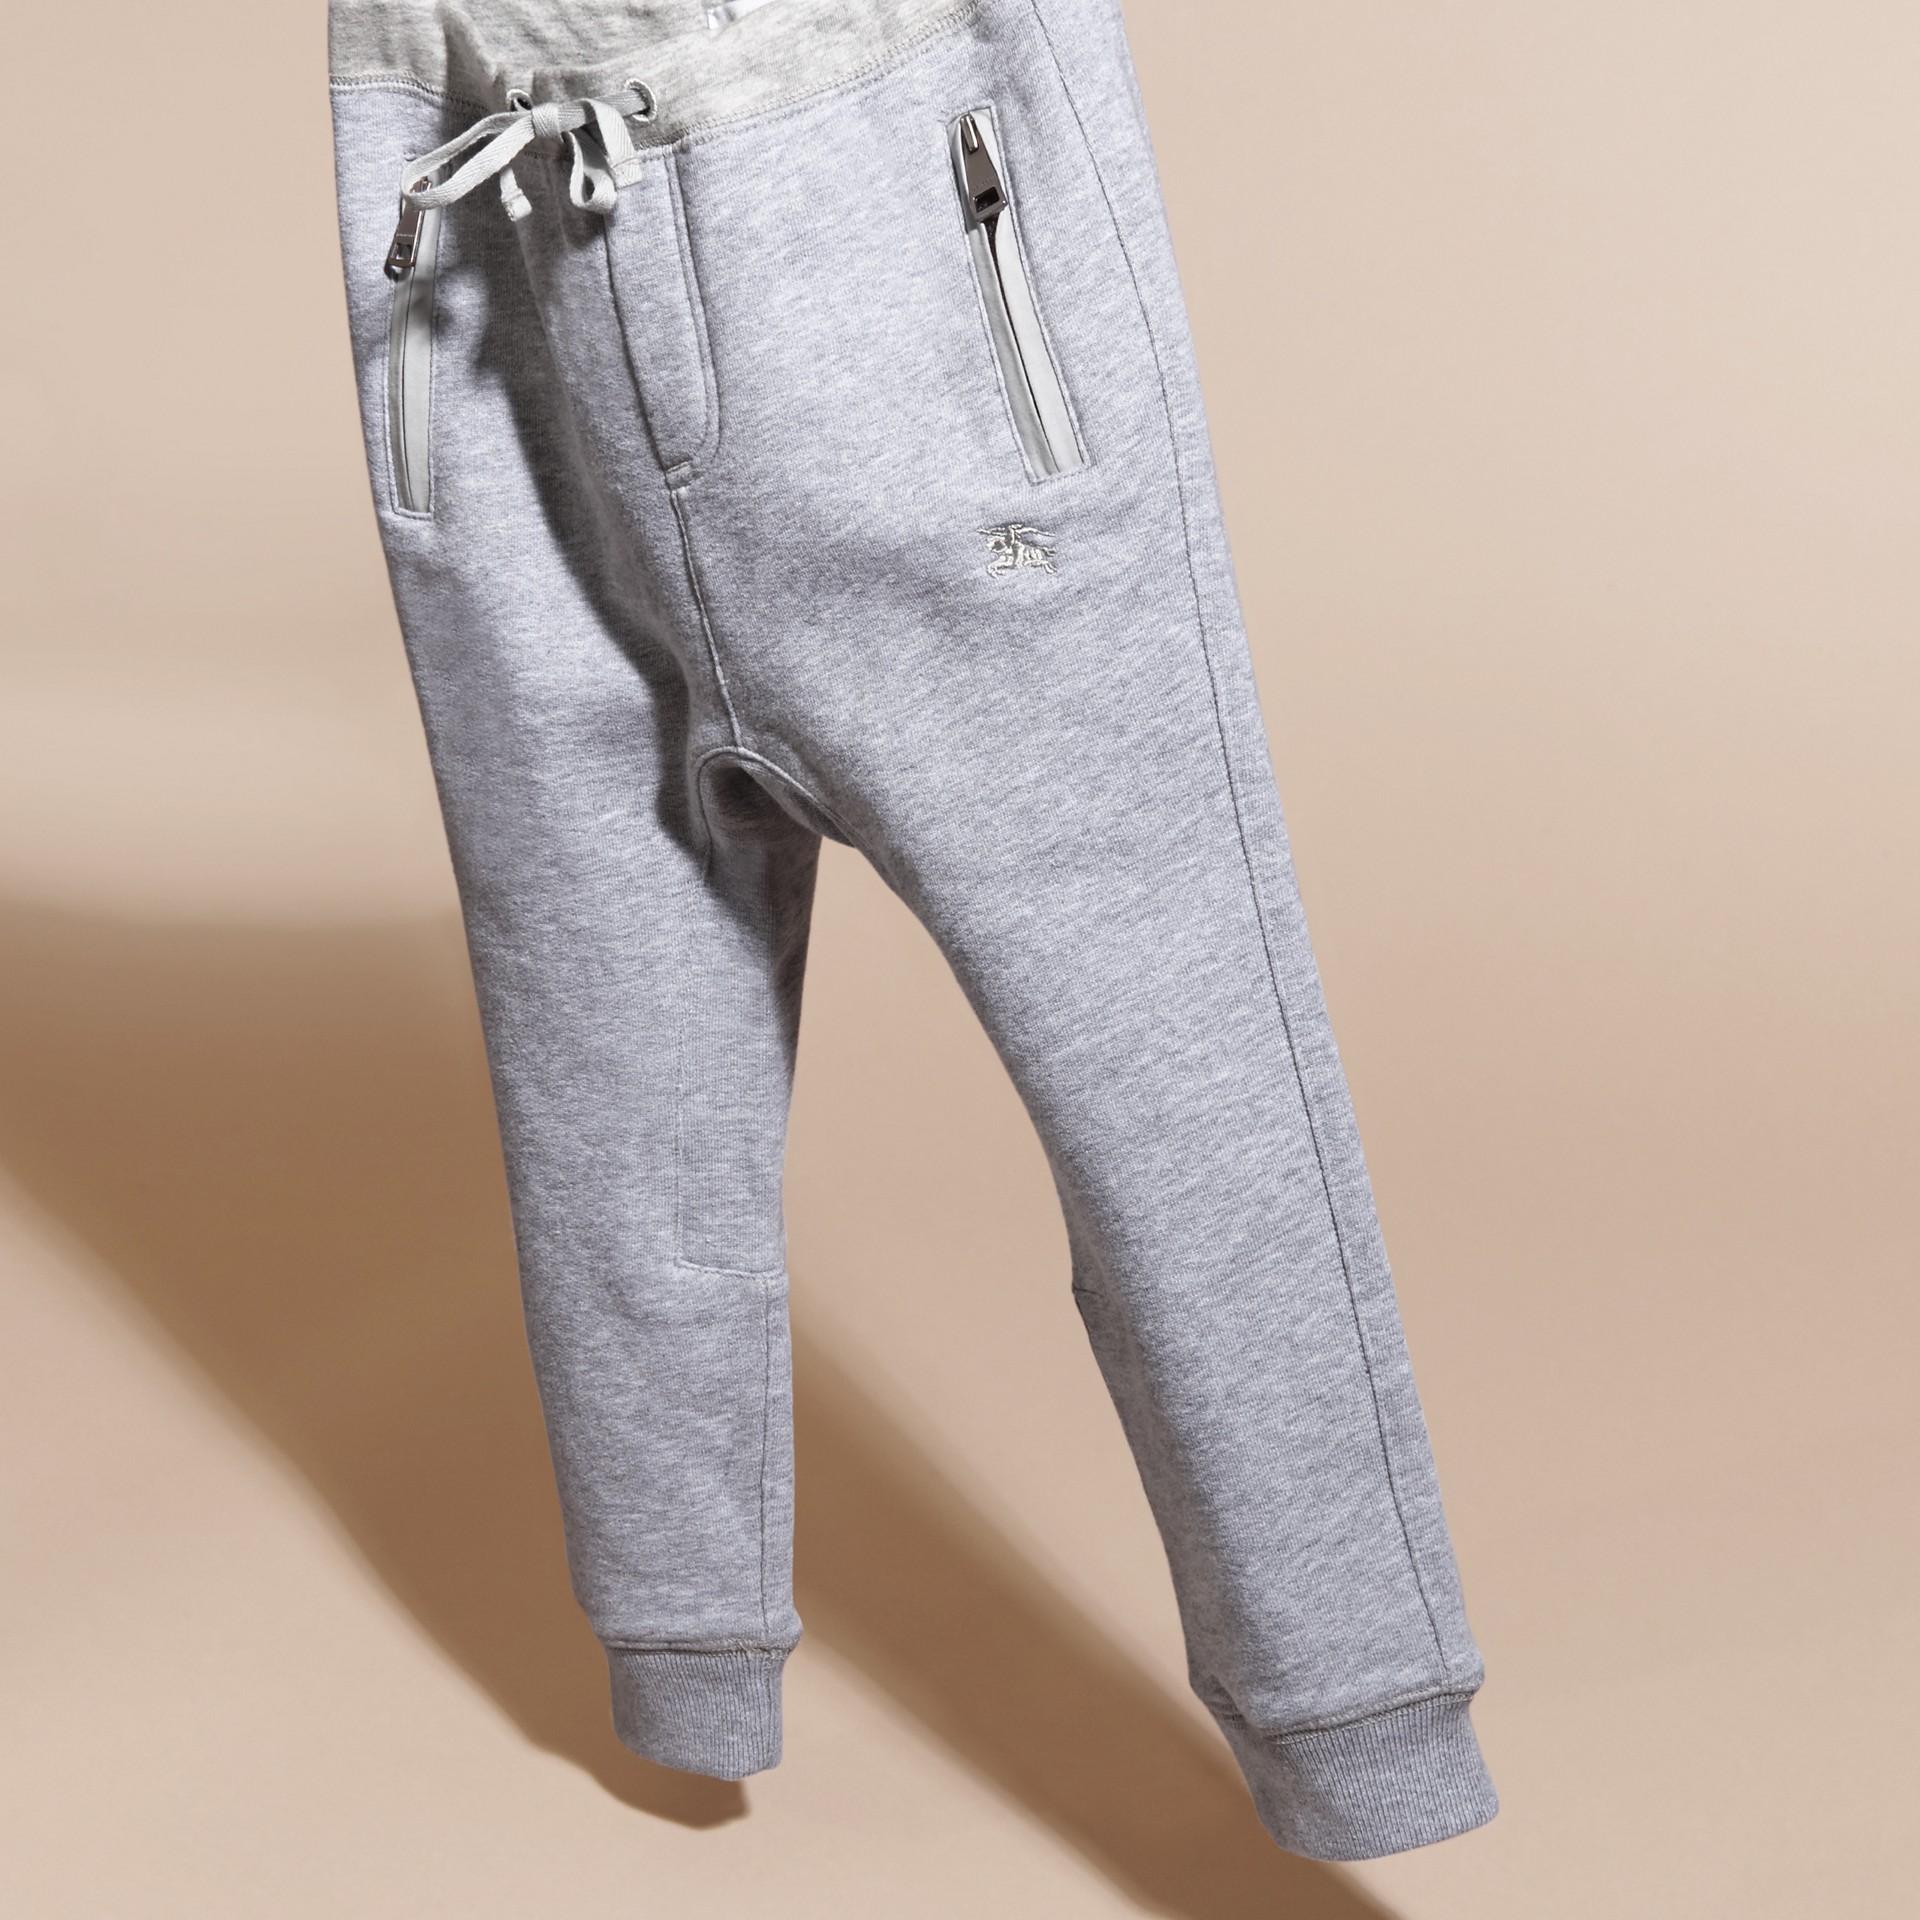 Camaïeu de gris moyens Pantalon de survêtement en coton Camaïeu  Gris Moyens - photo de la galerie 3